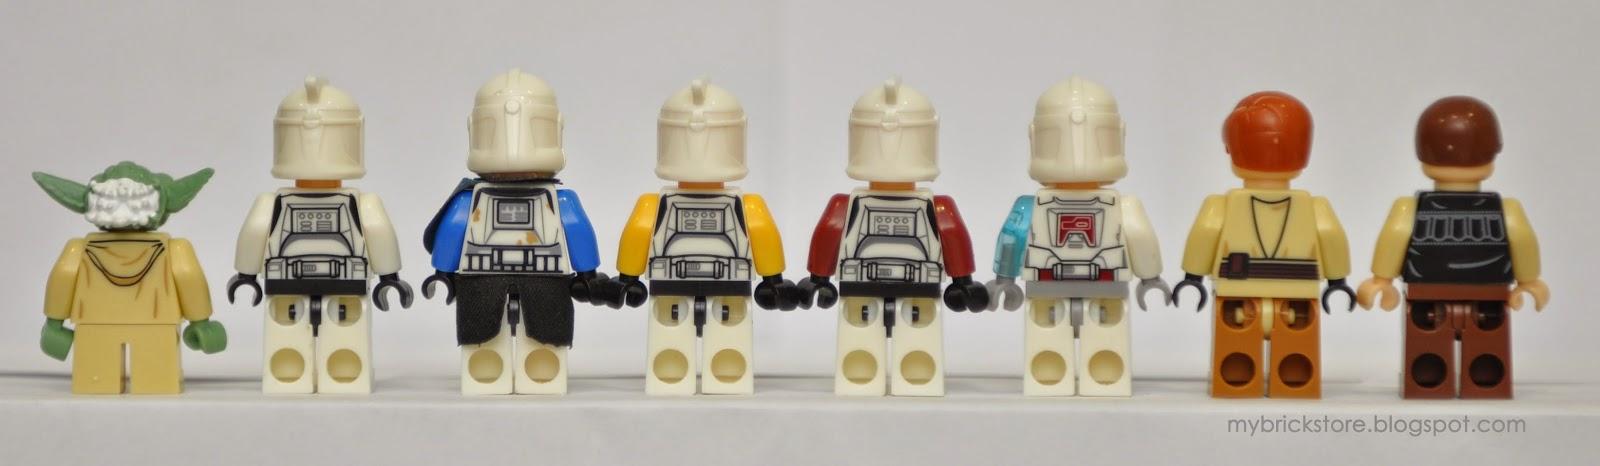 My Brick Store: Lego Star Wars, bootleg by Sheng Yuan